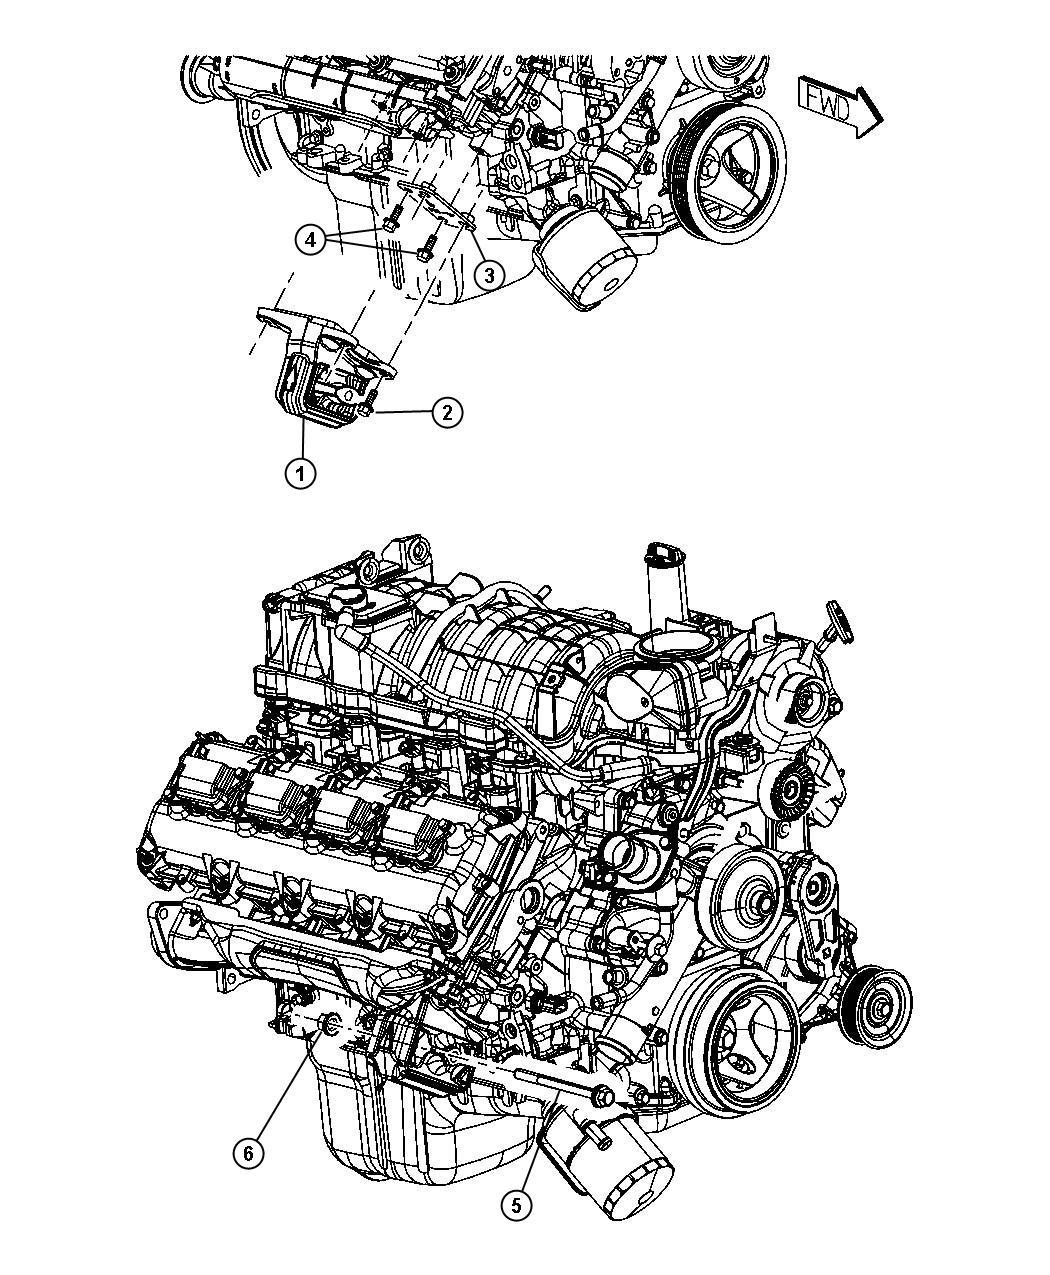 Ram 2500 Insulator. Engine mount. Right side. Mounting